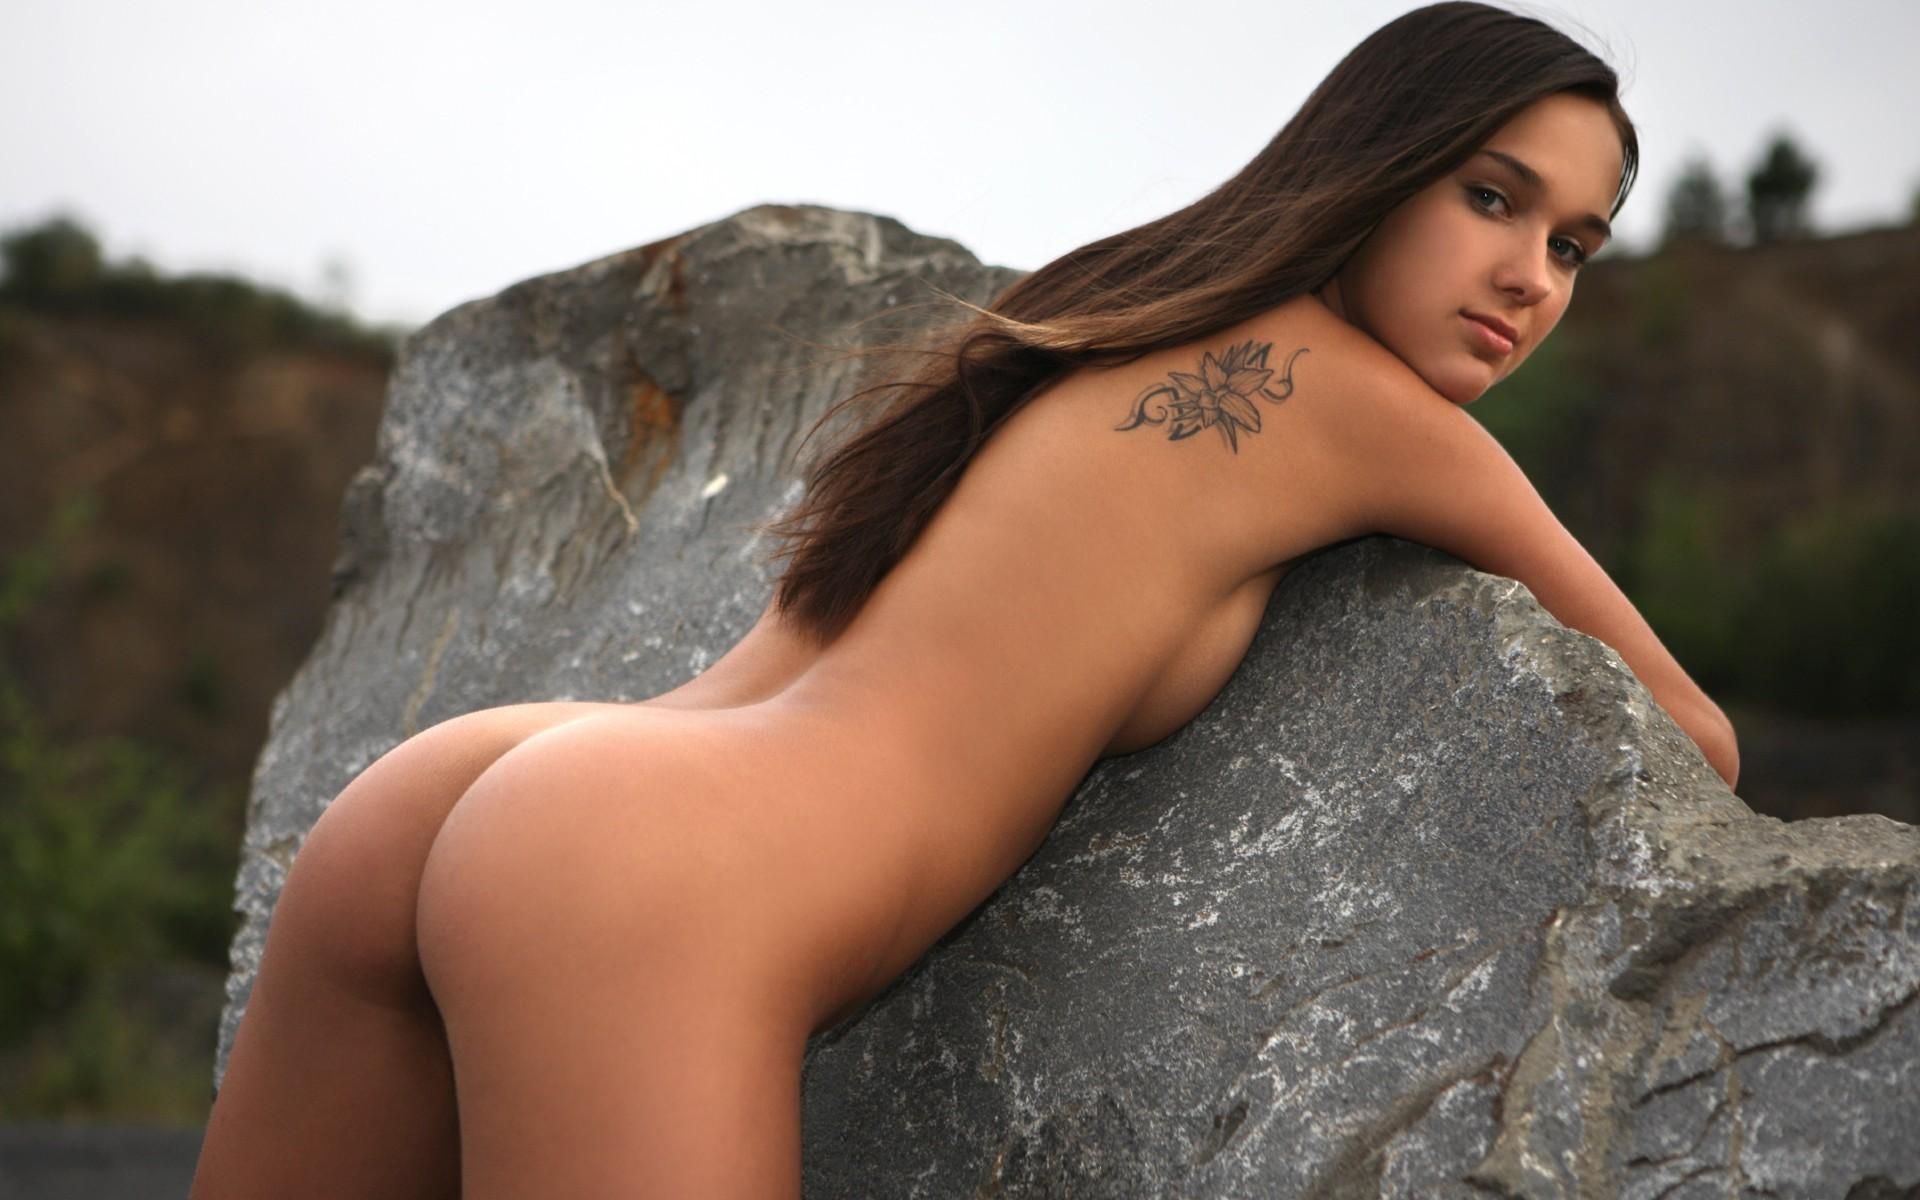 fotogalereya-krasivih-devushek-seksi-golih-porno-onlayn-russkoe-podglyadivanie